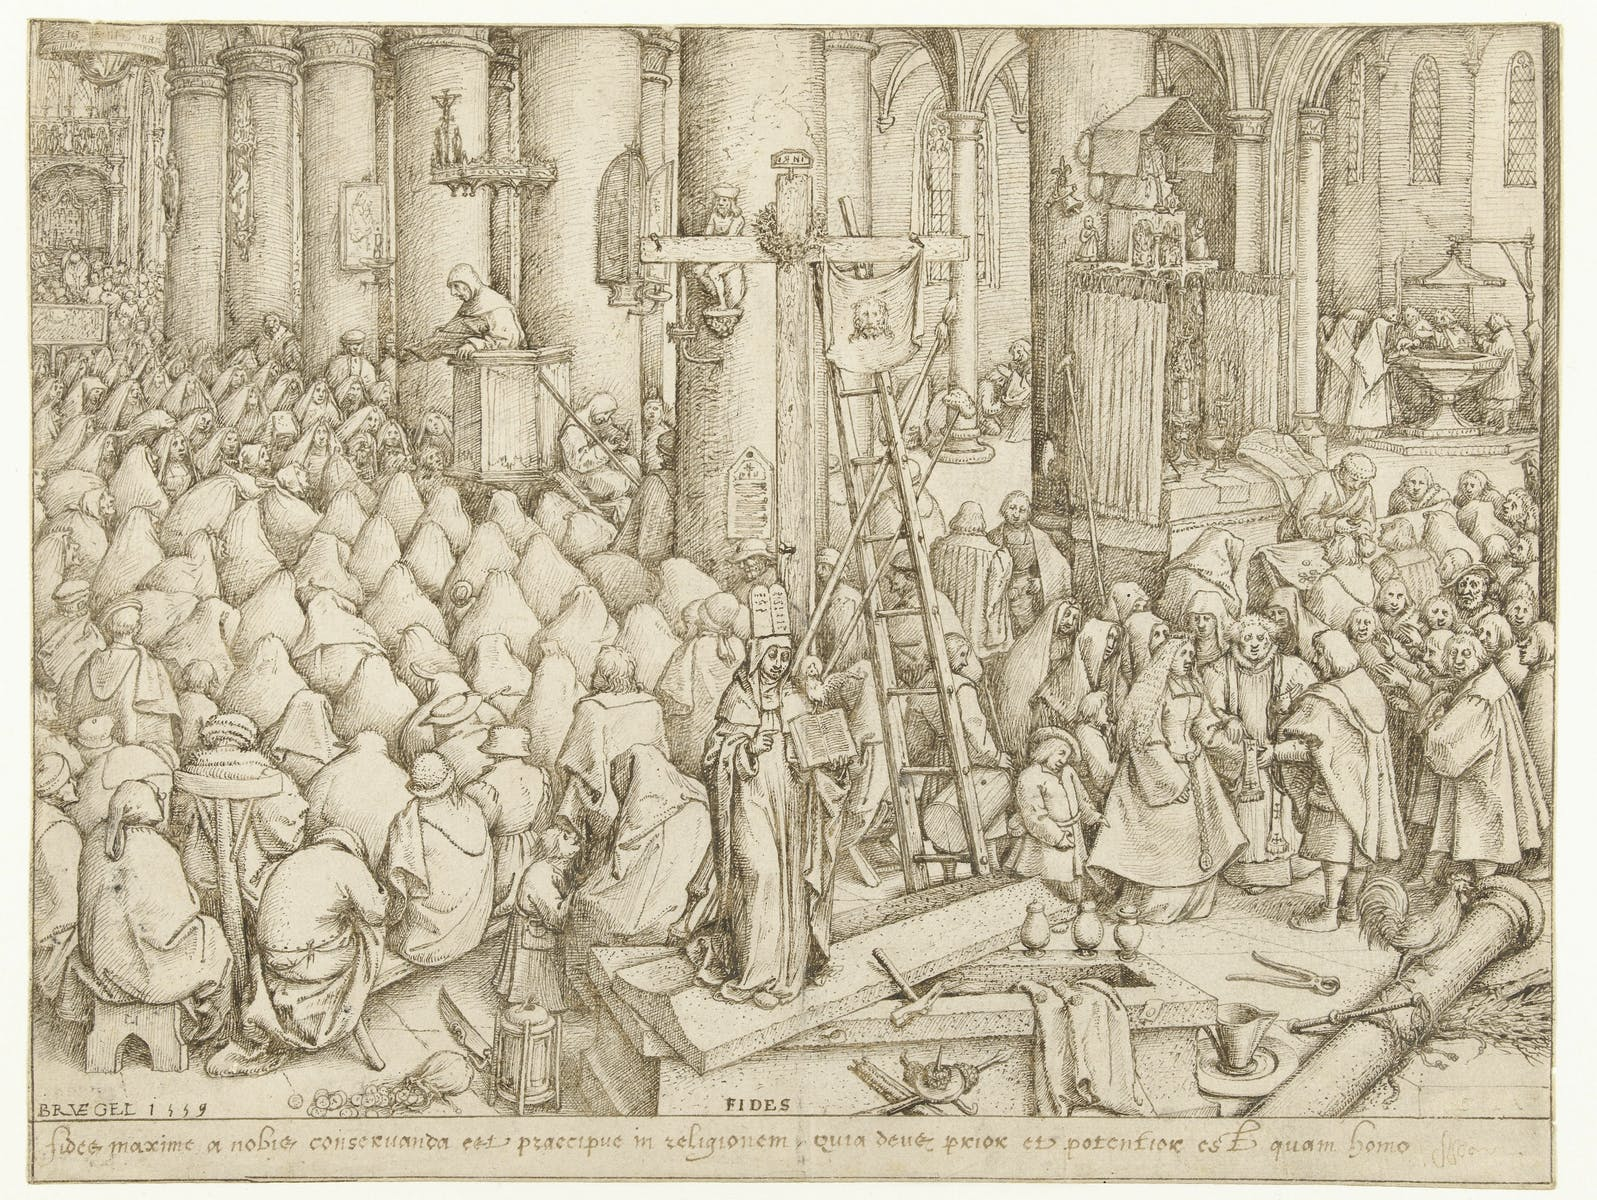 Pieter Bruegel the Elder, Fides (Faith)